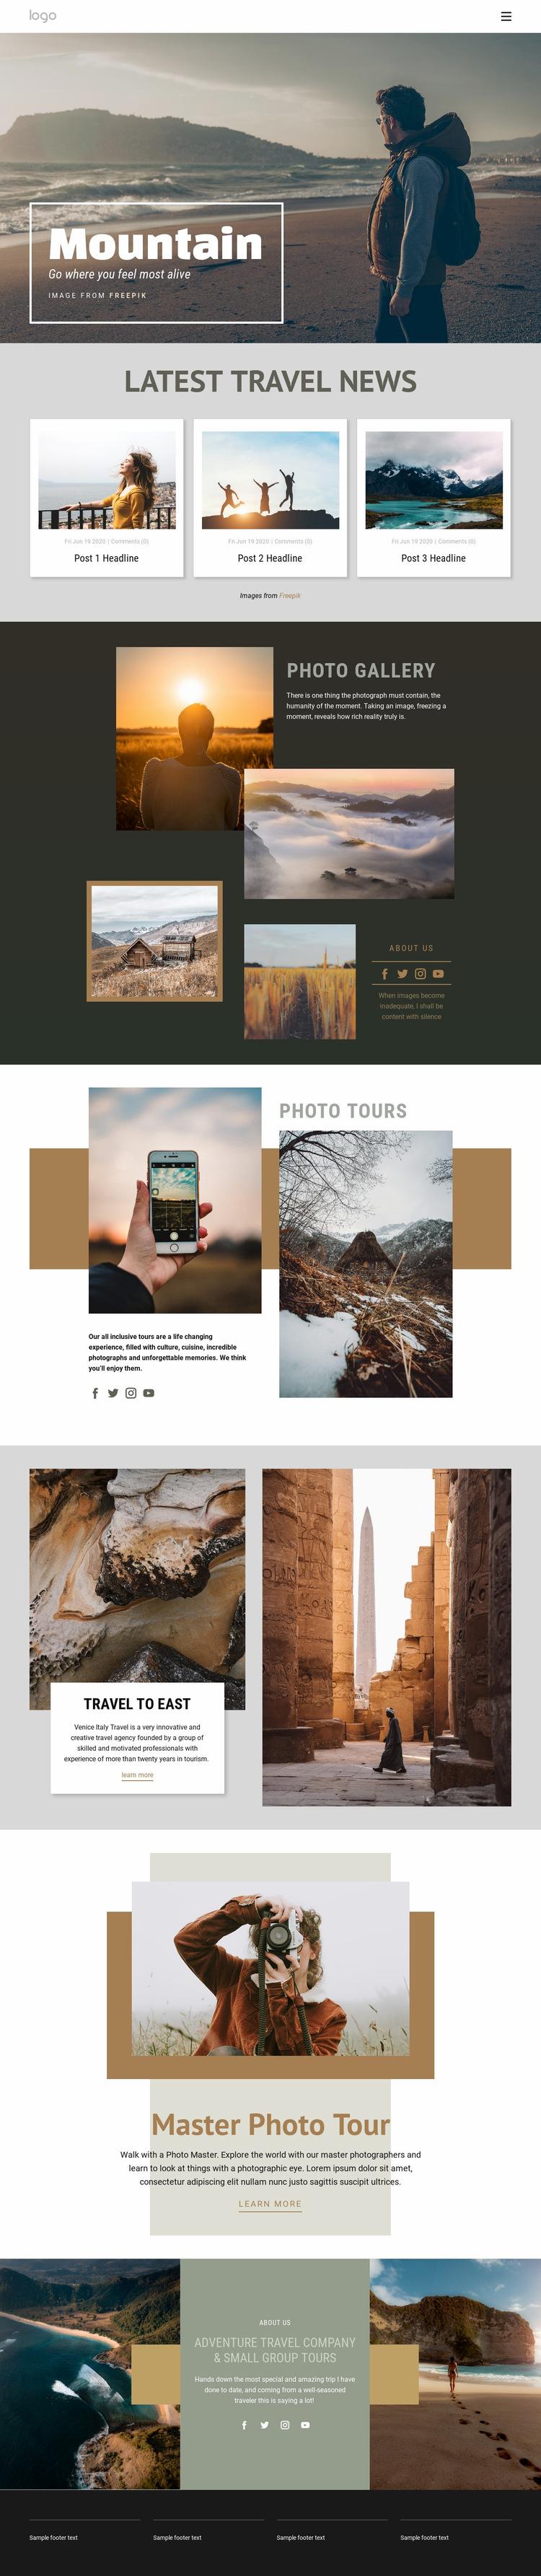 Mountain advanture travel Web Page Design